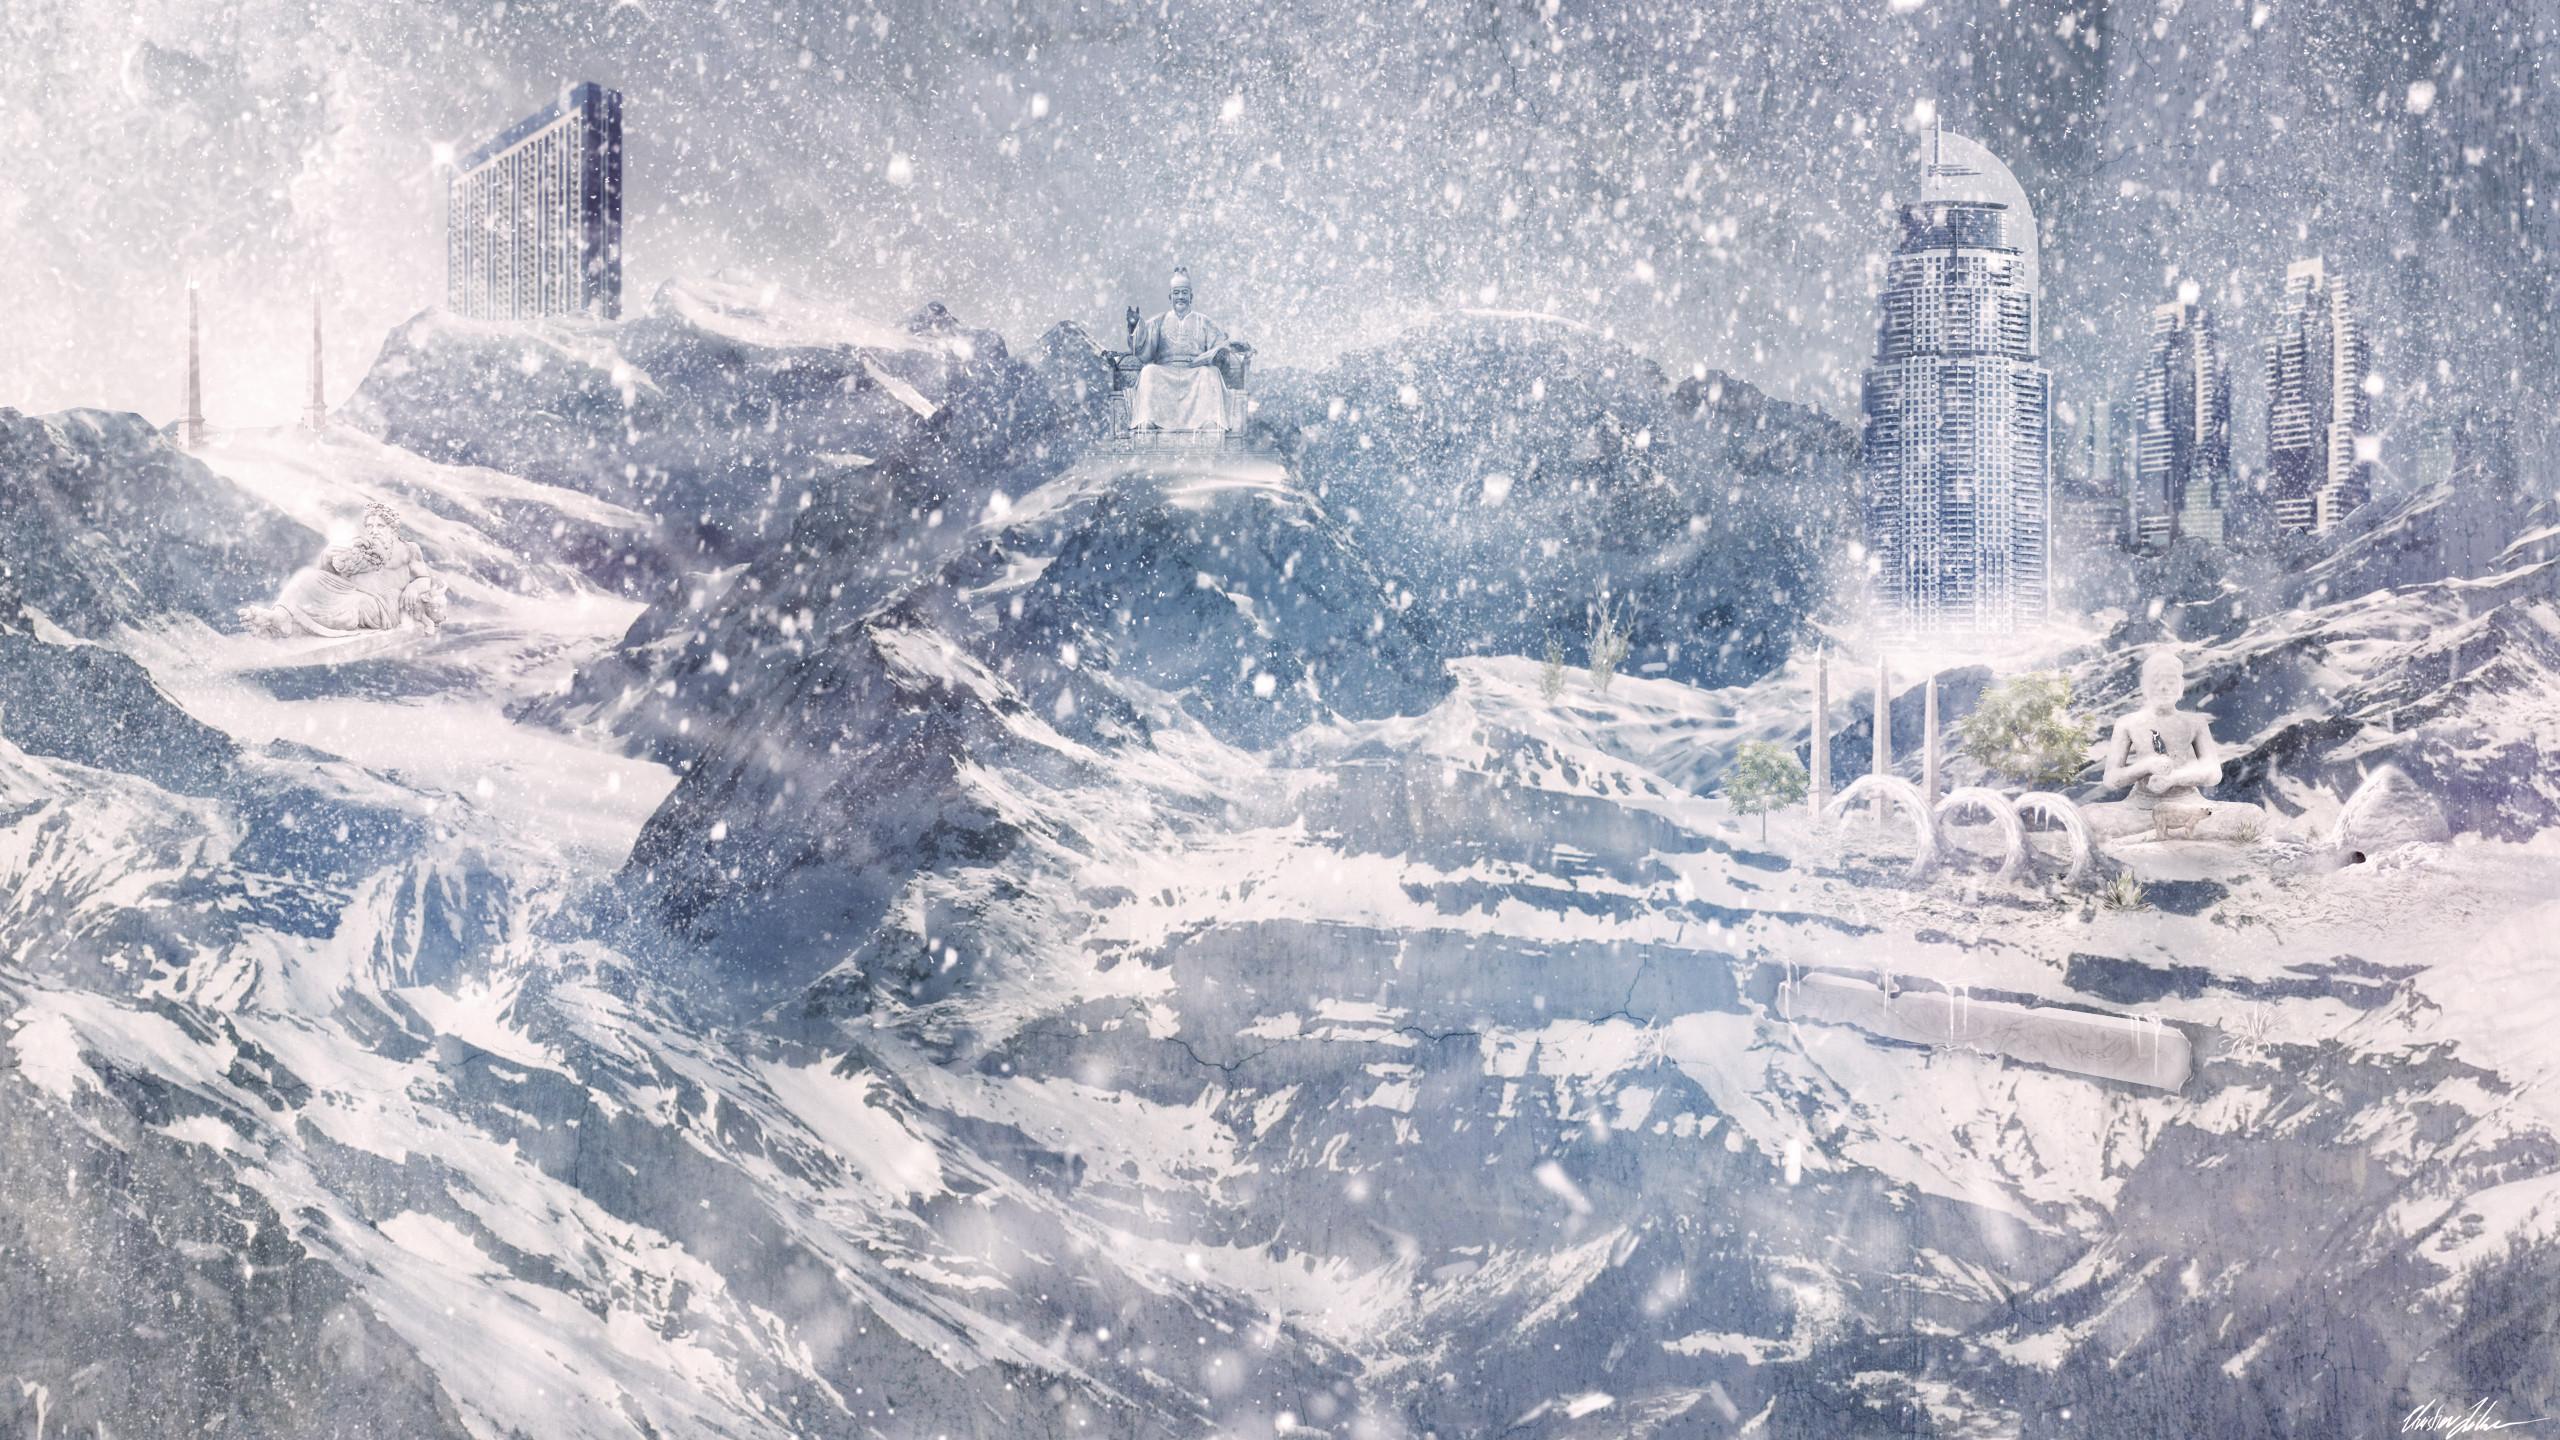 winter blizzard wallpaper wallpapersafari